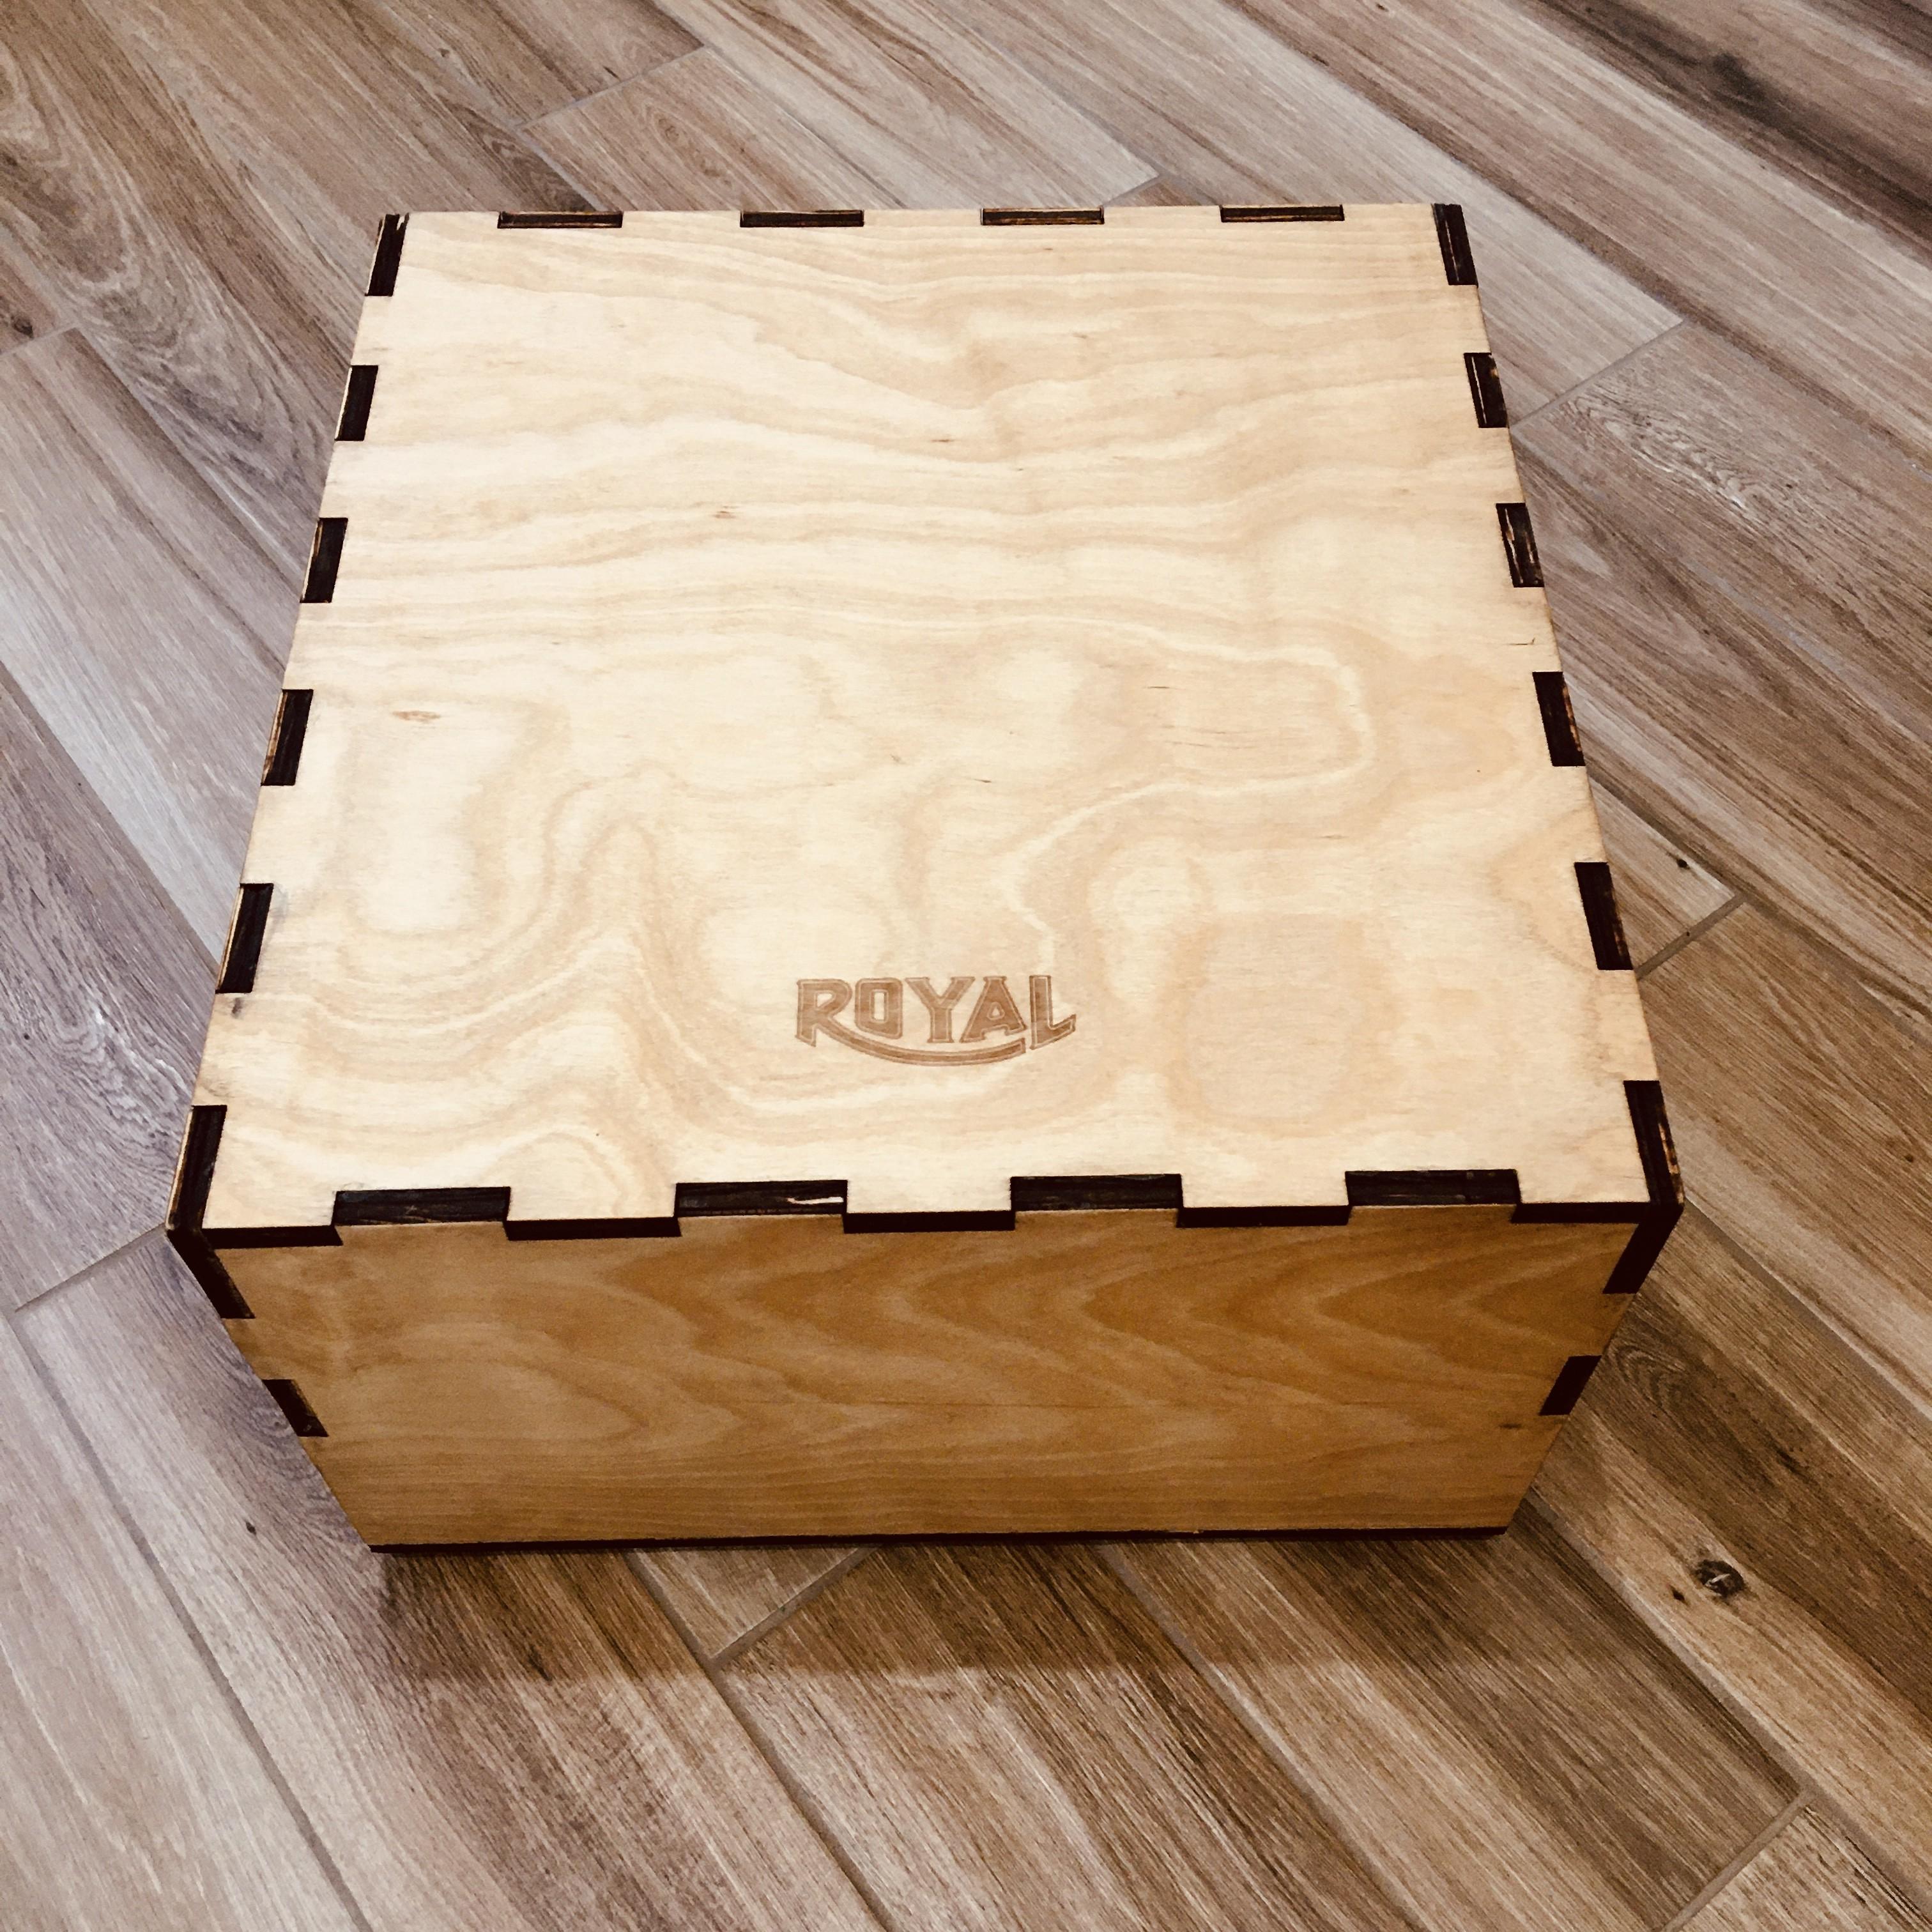 Storage Case for 1947 Royal KMM